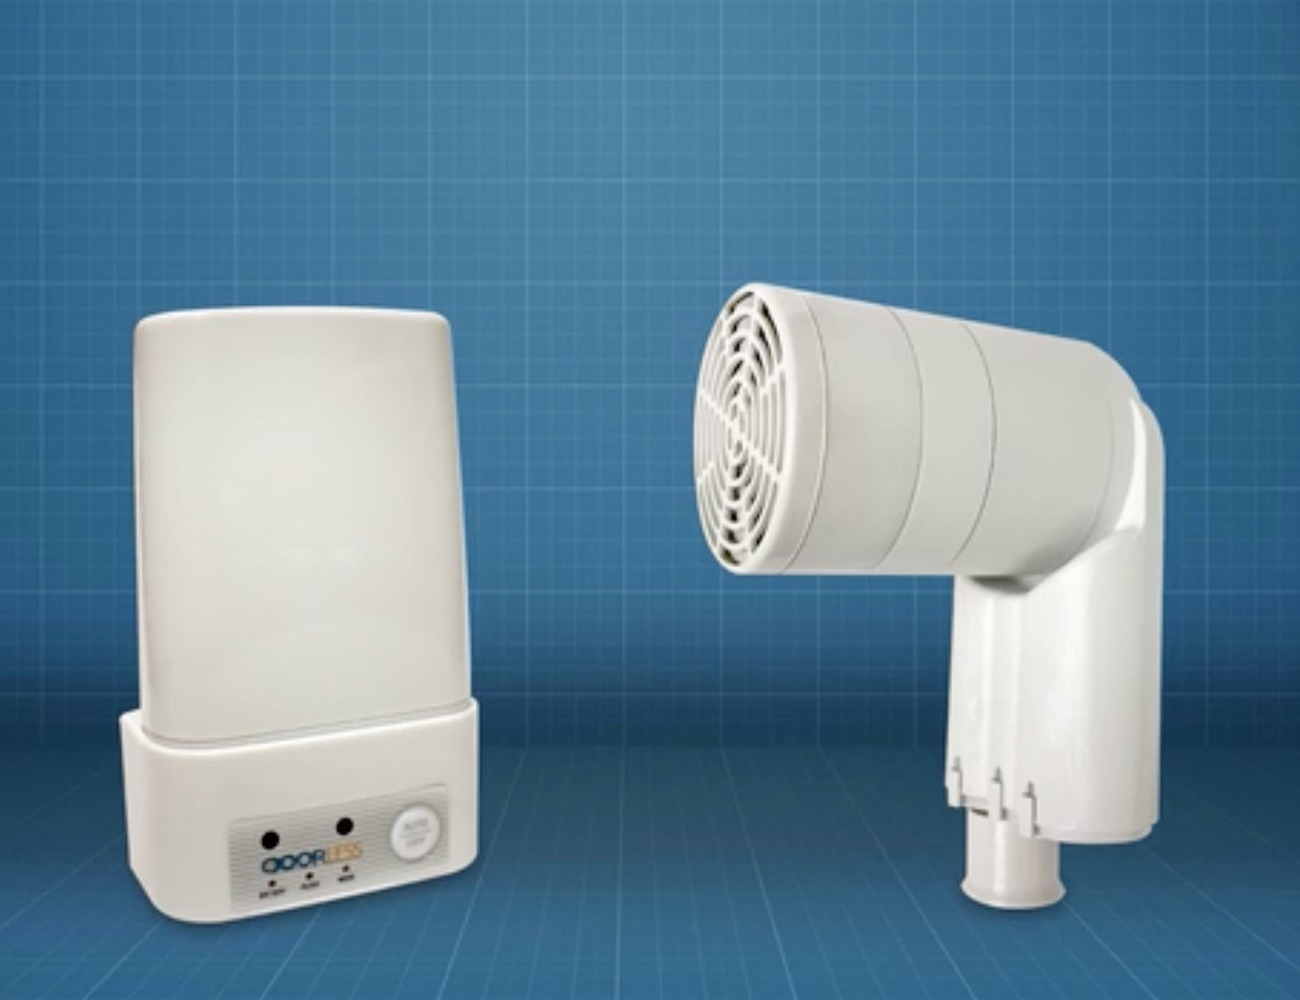 Best Odor Neutralizer Best Odor Eliminator For Bathroom